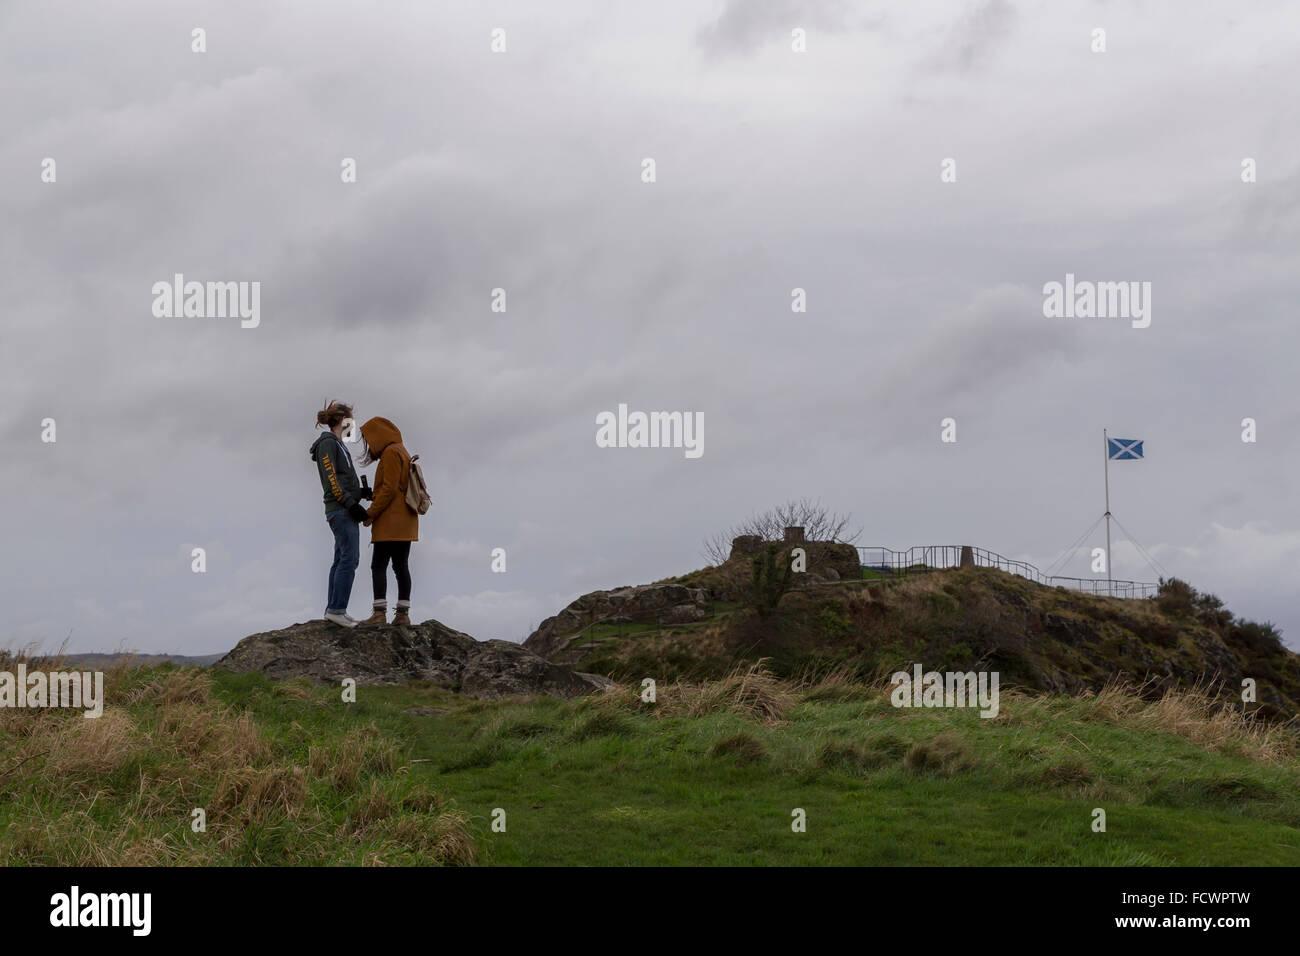 weather conditions Dumbarton, Dumbarton castle, 29/12/2015 - Stock Image